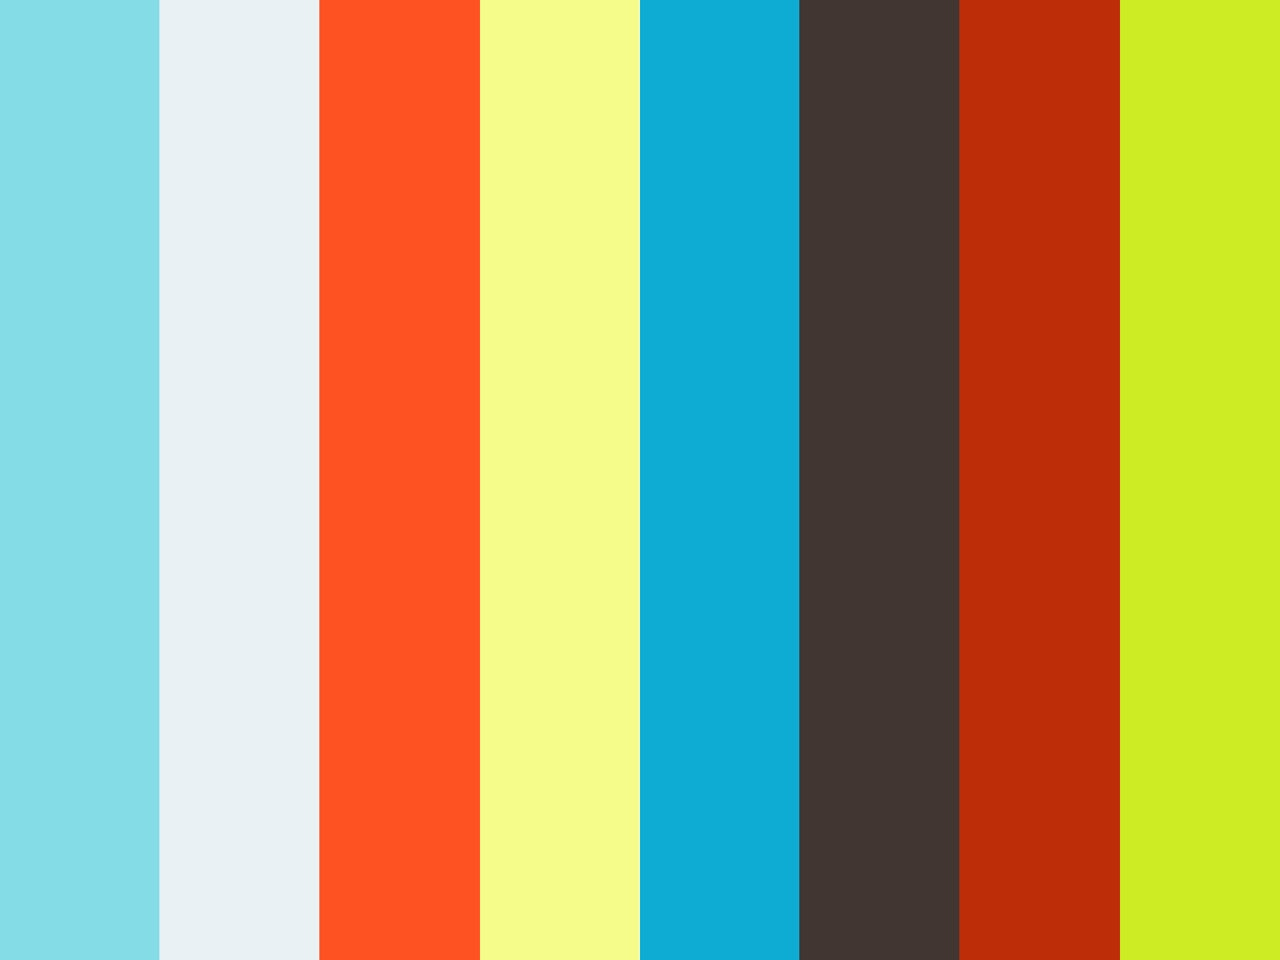 ABLUKA - JEDER MISSTRAUT JEDEM | Emin Alper | Trailer (OmdU)